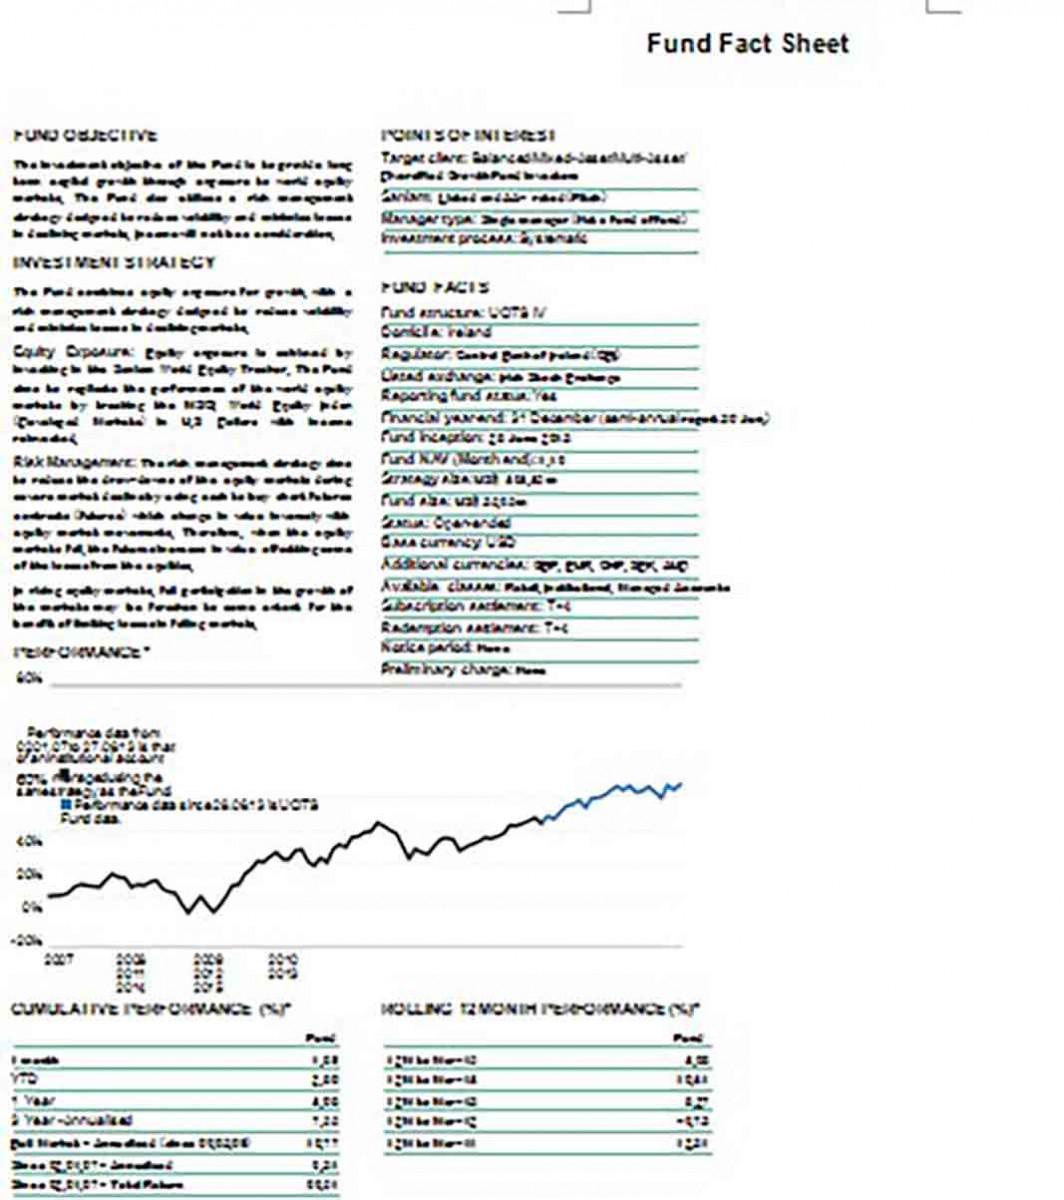 Fund Fact Sheet templates